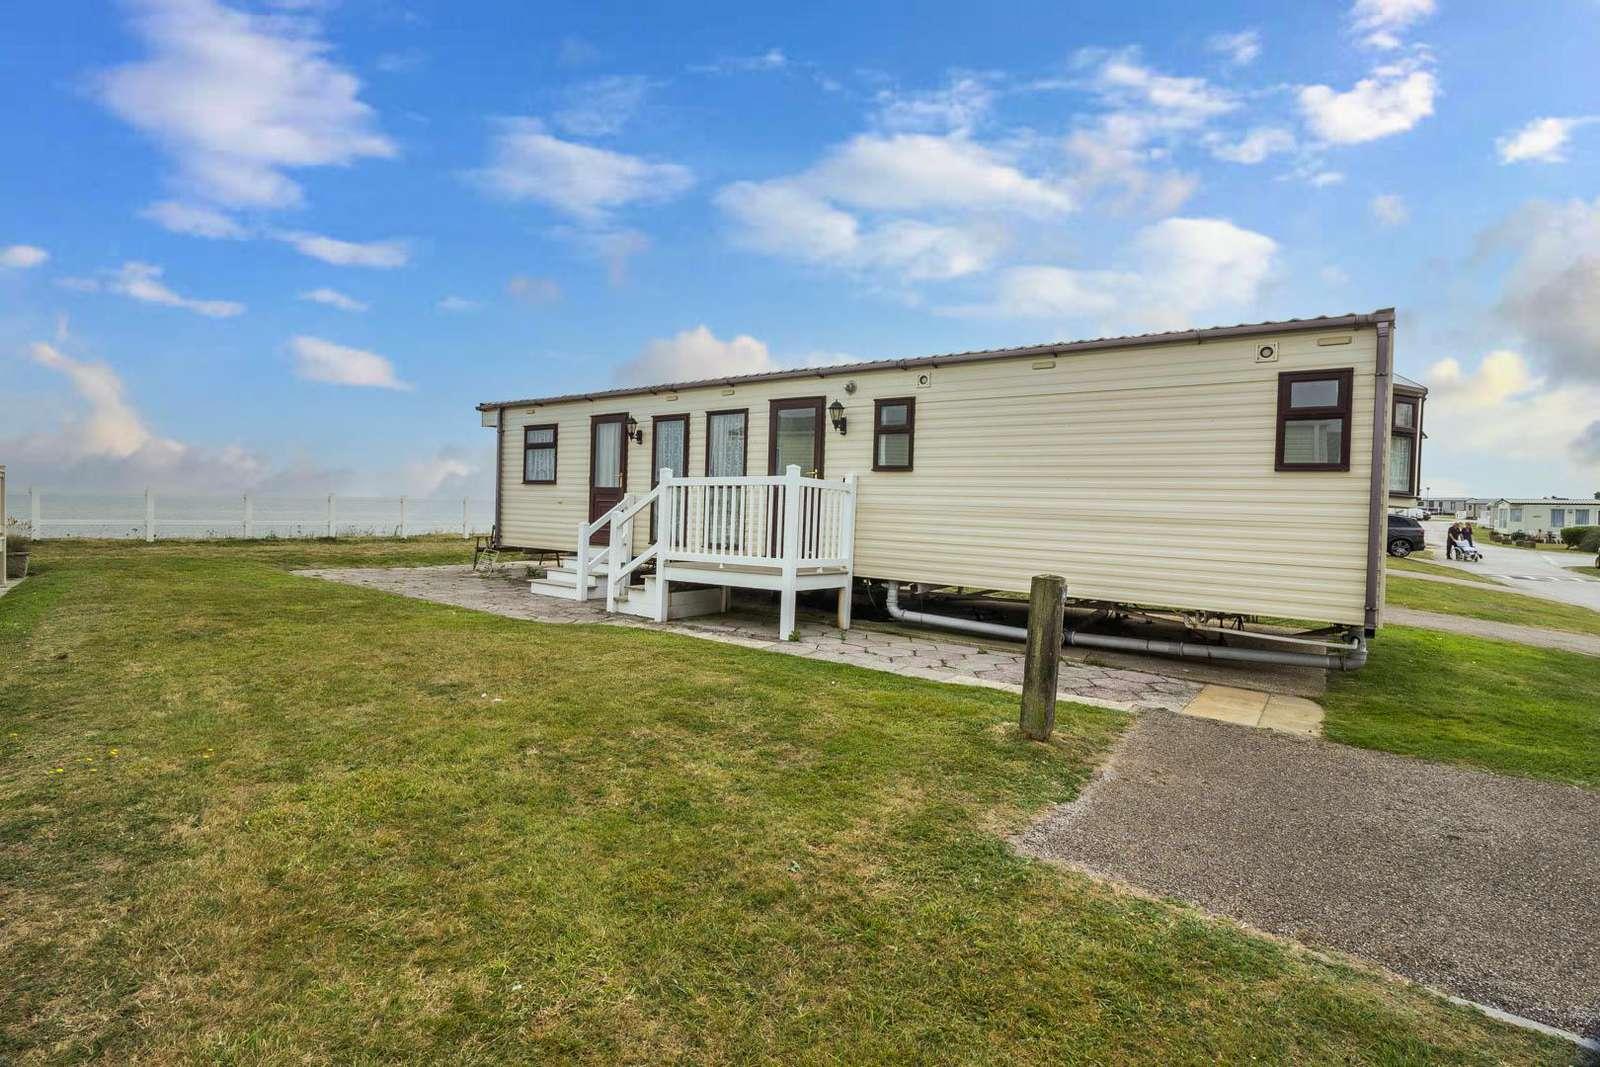 80004OV – Ocean view area, 2 bed, 6 berth caravan with full sea views. Diamond Rated. - property